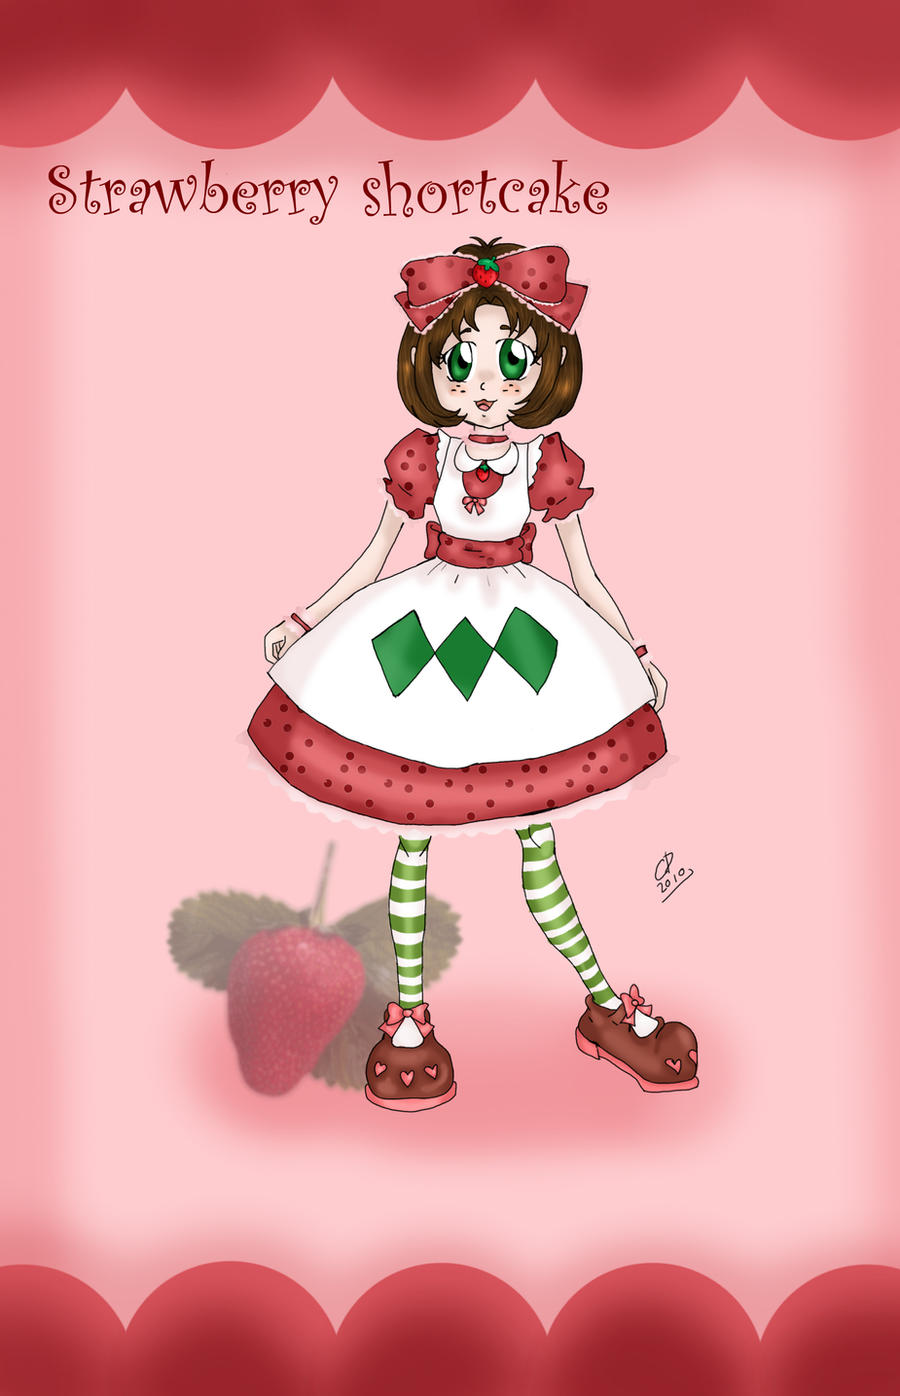 Strawberry shortcake by Hotaru-oz